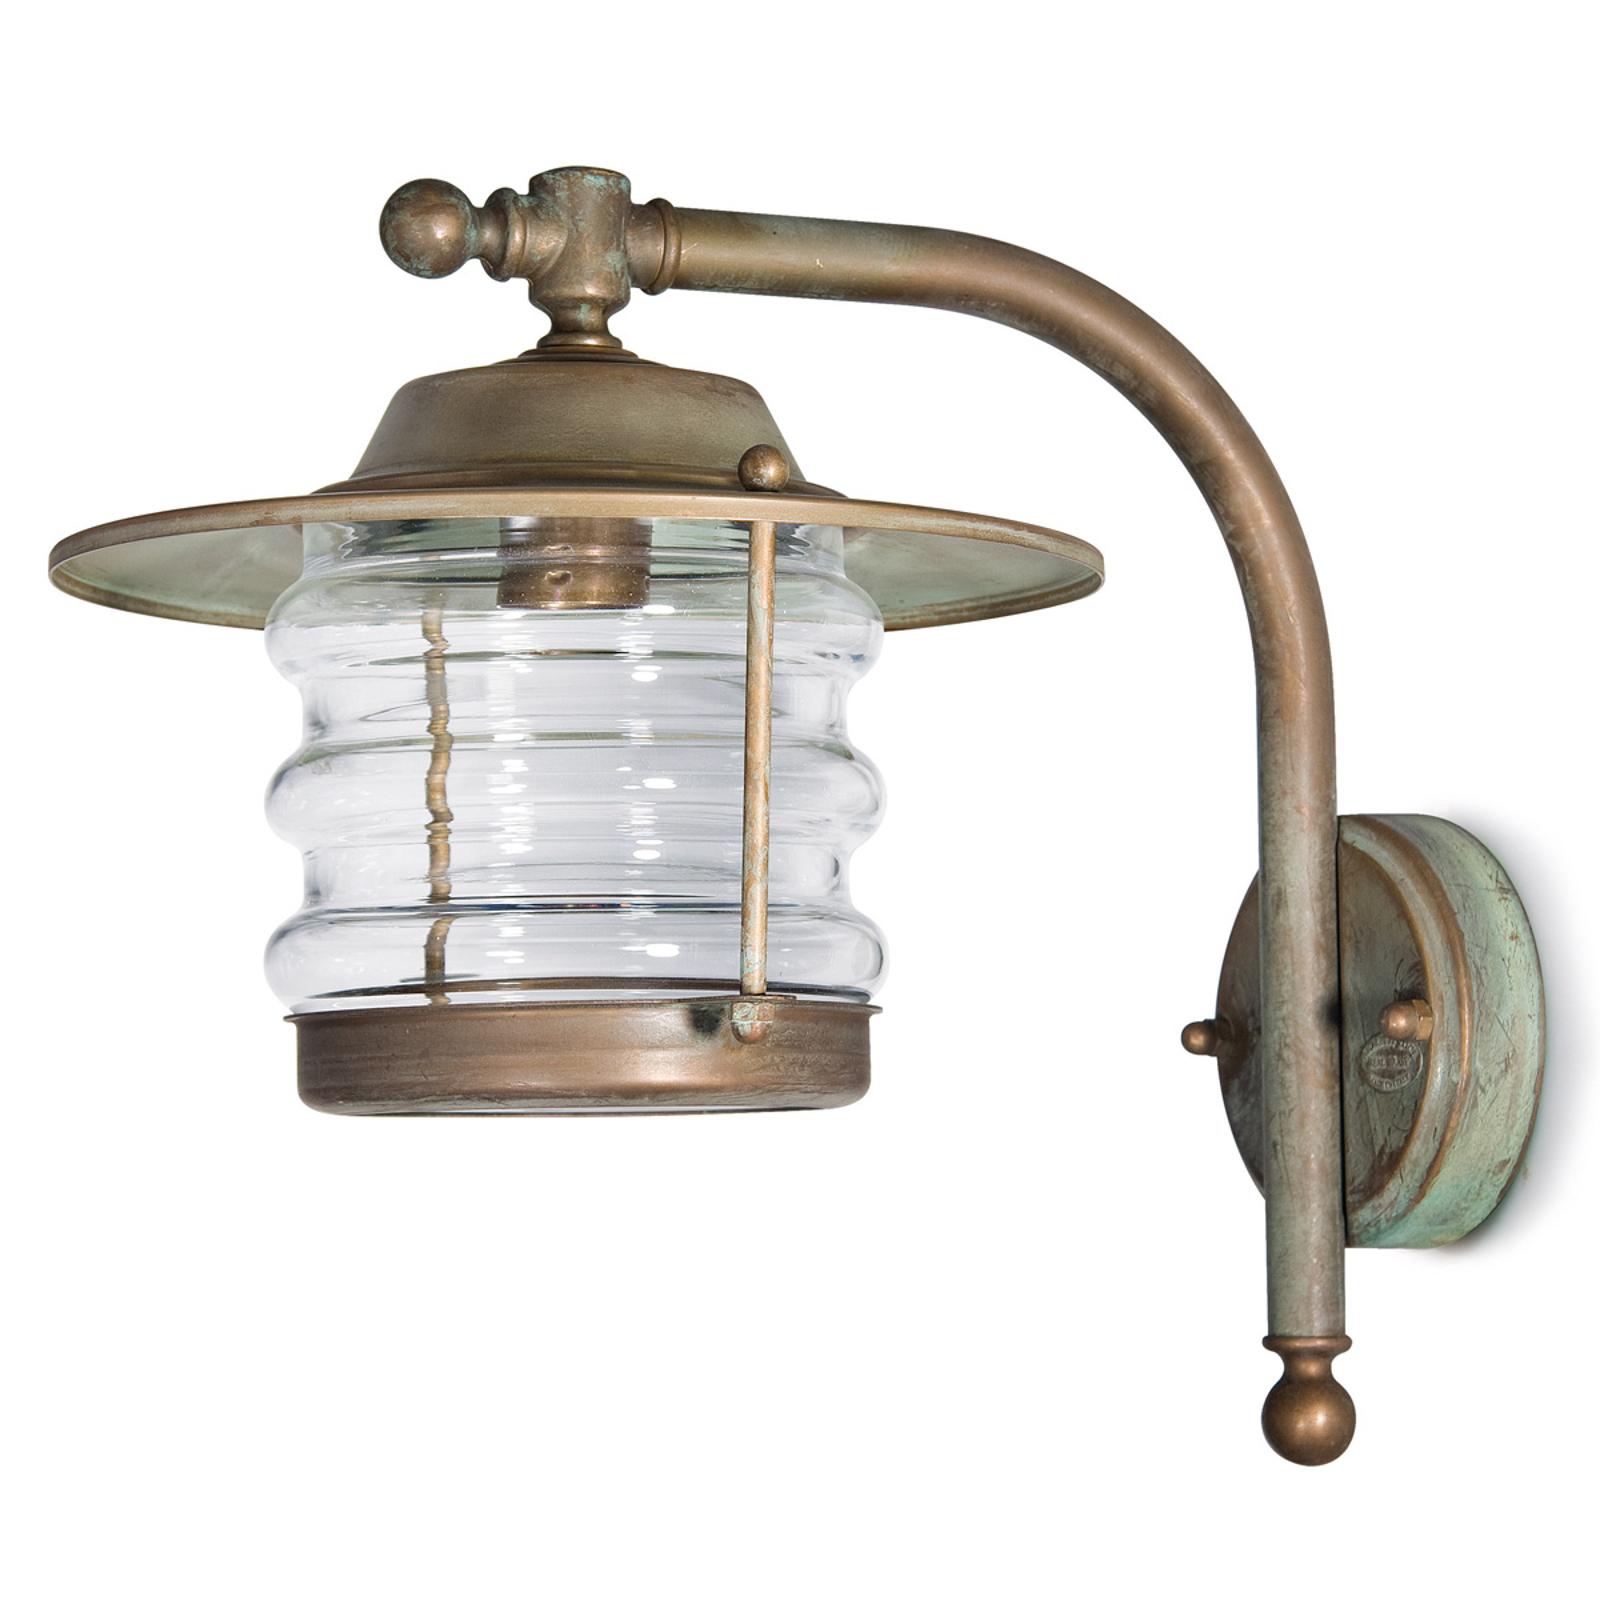 Utevegglampe Adessora, lanterne - tåler sjøvann